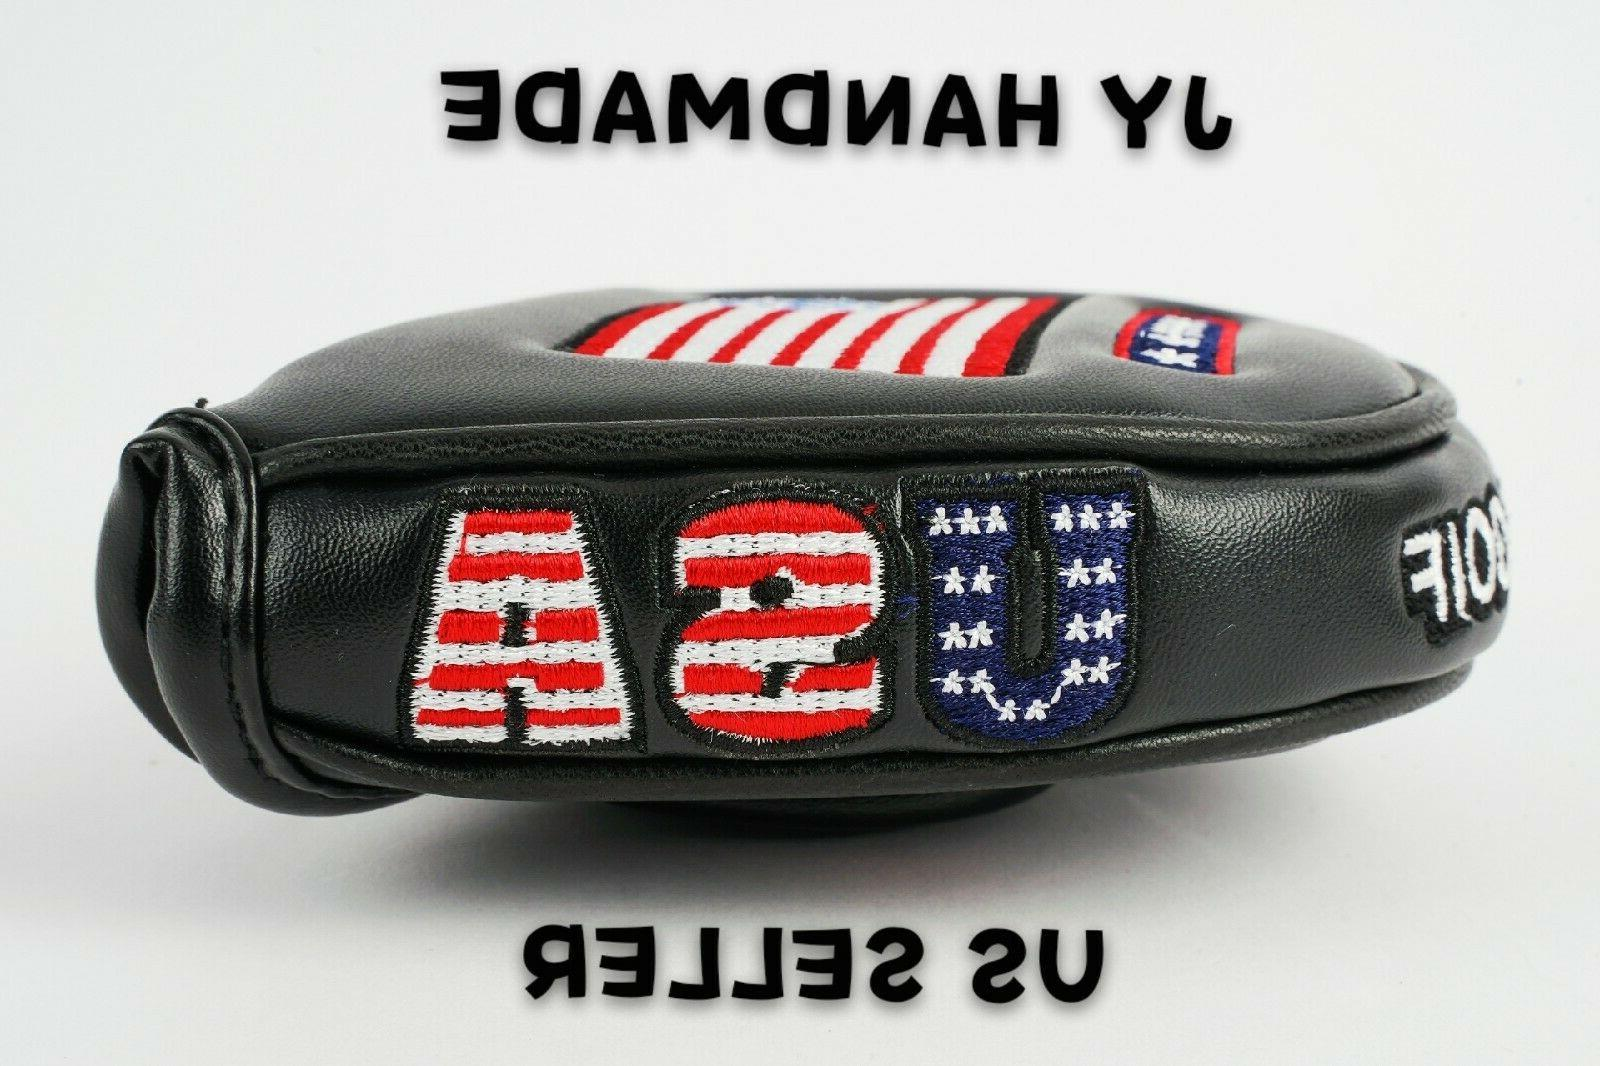 AMERICA BLACK Putter Cover Cameron 2ball US